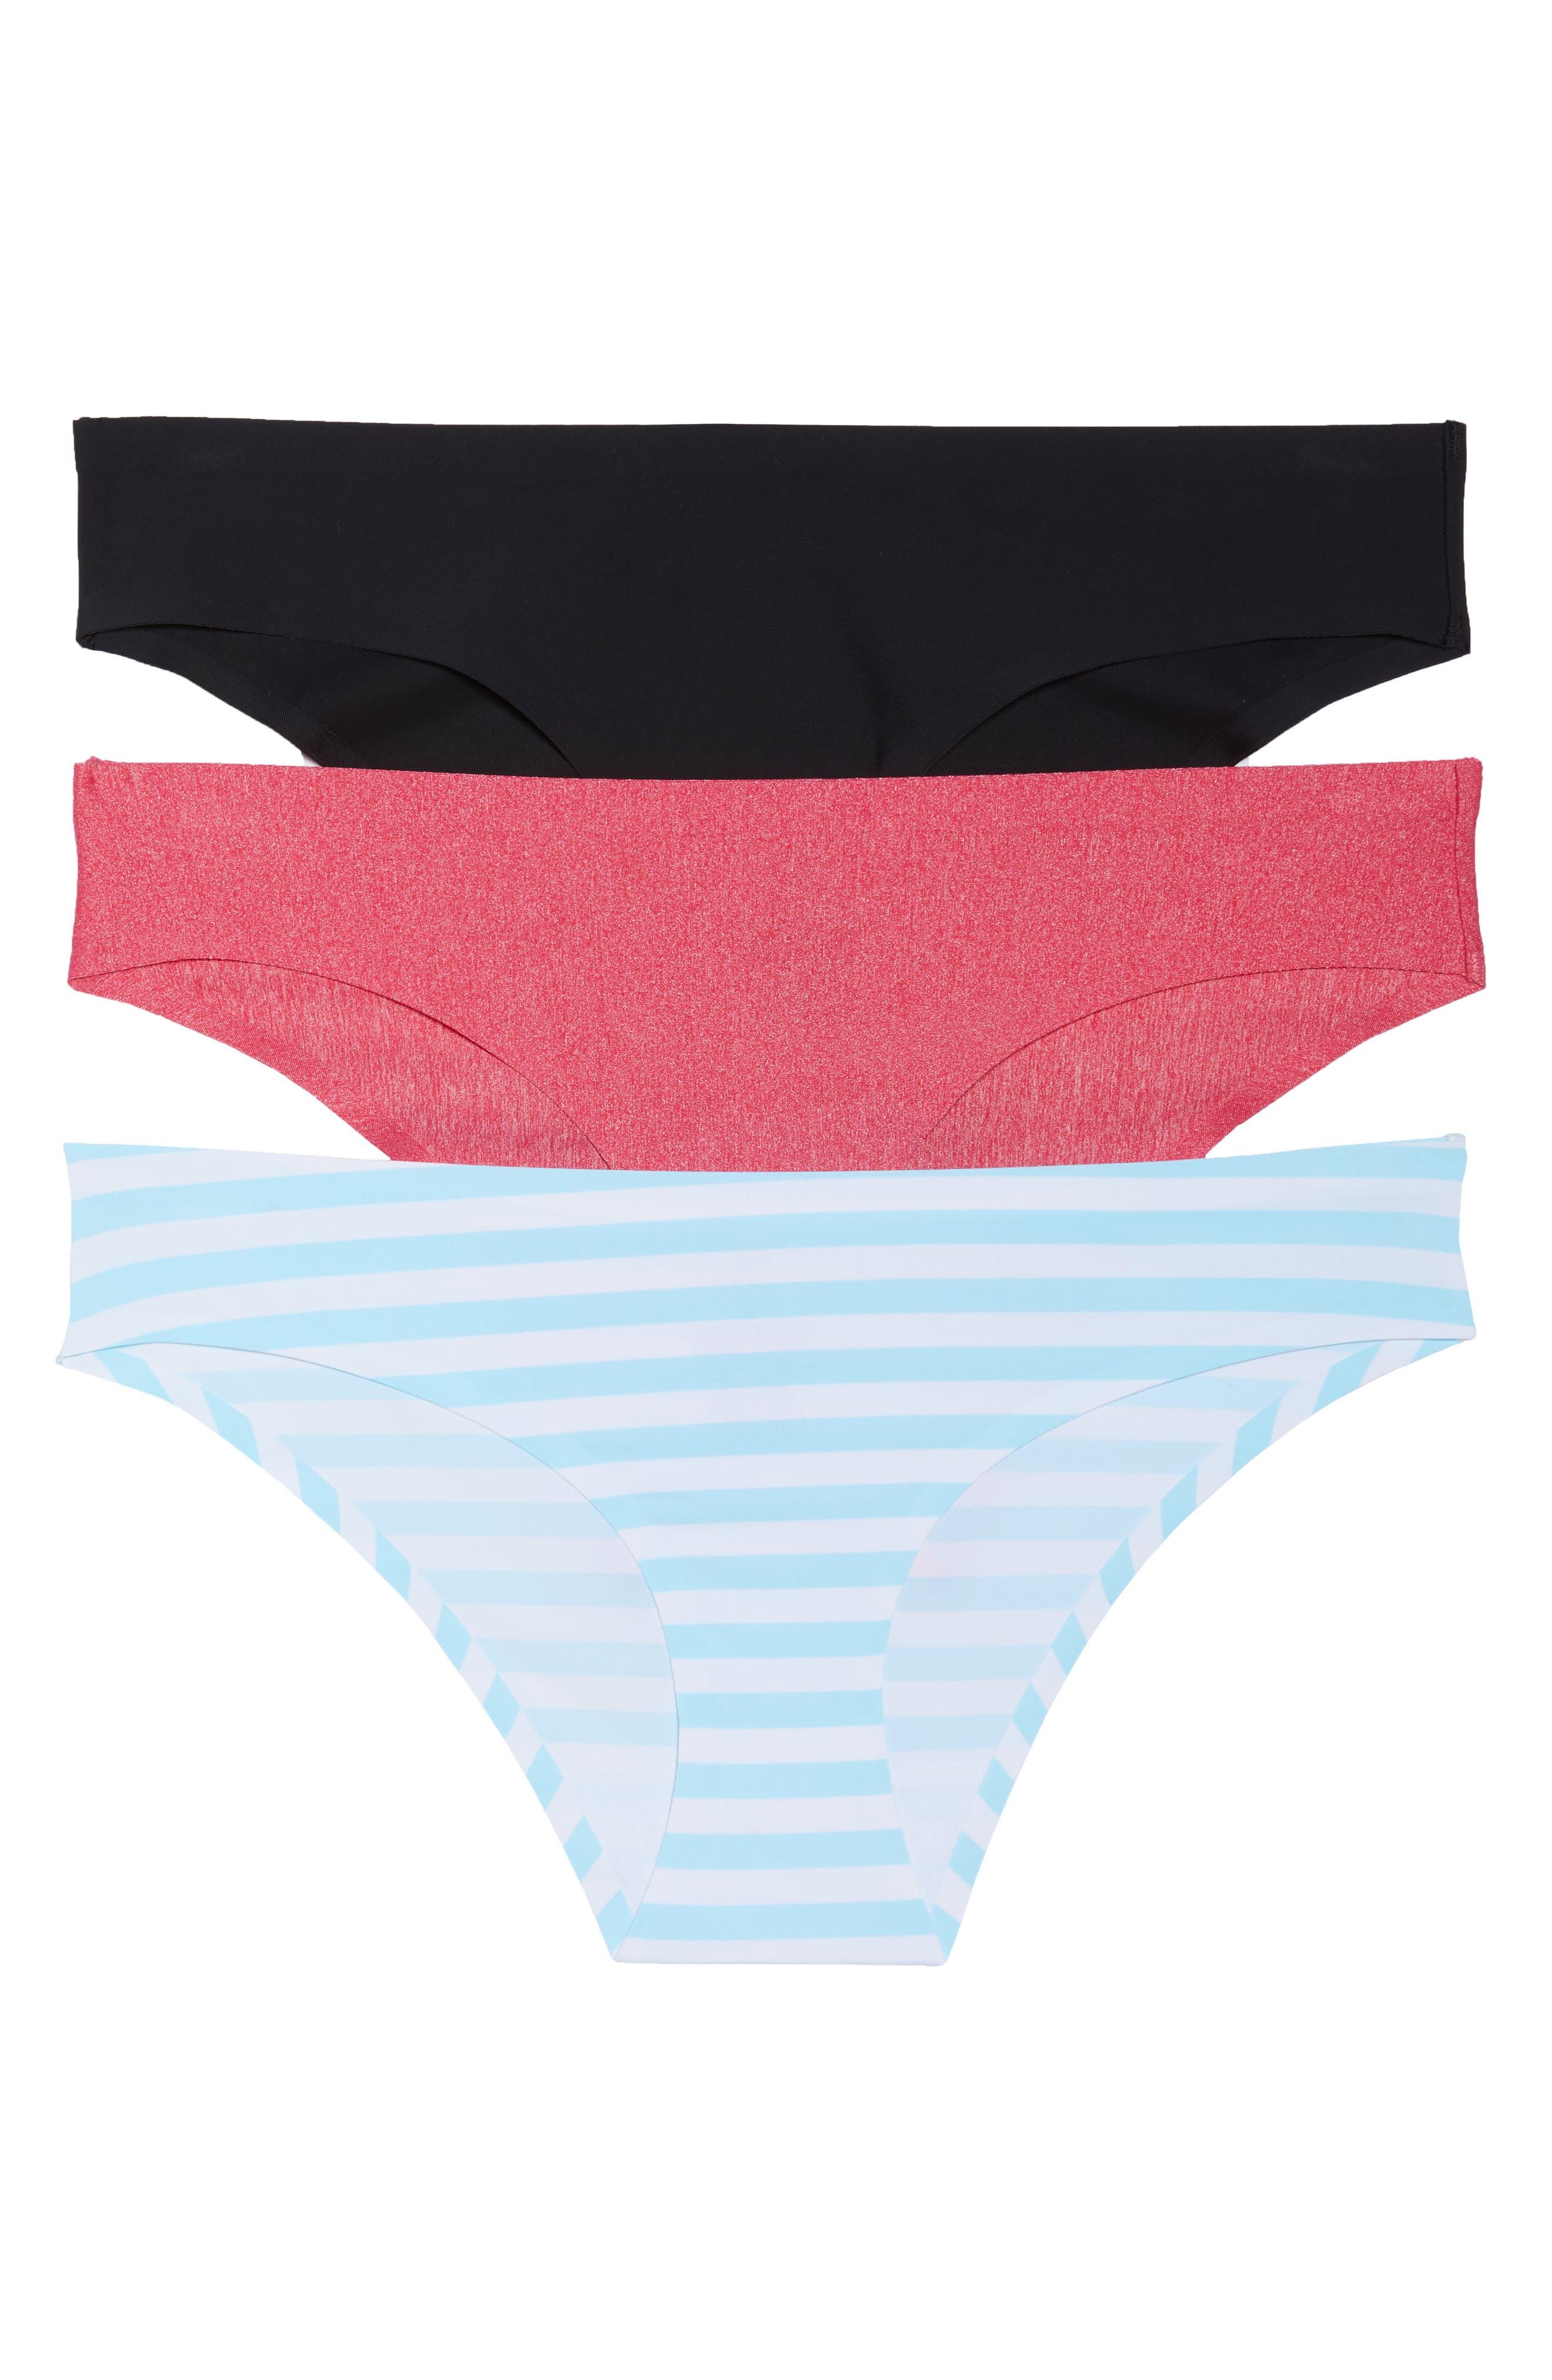 3-Pack Hipster Panties,                             Main thumbnail 1, color,                             Black/ Poppy/ Marine Stripe